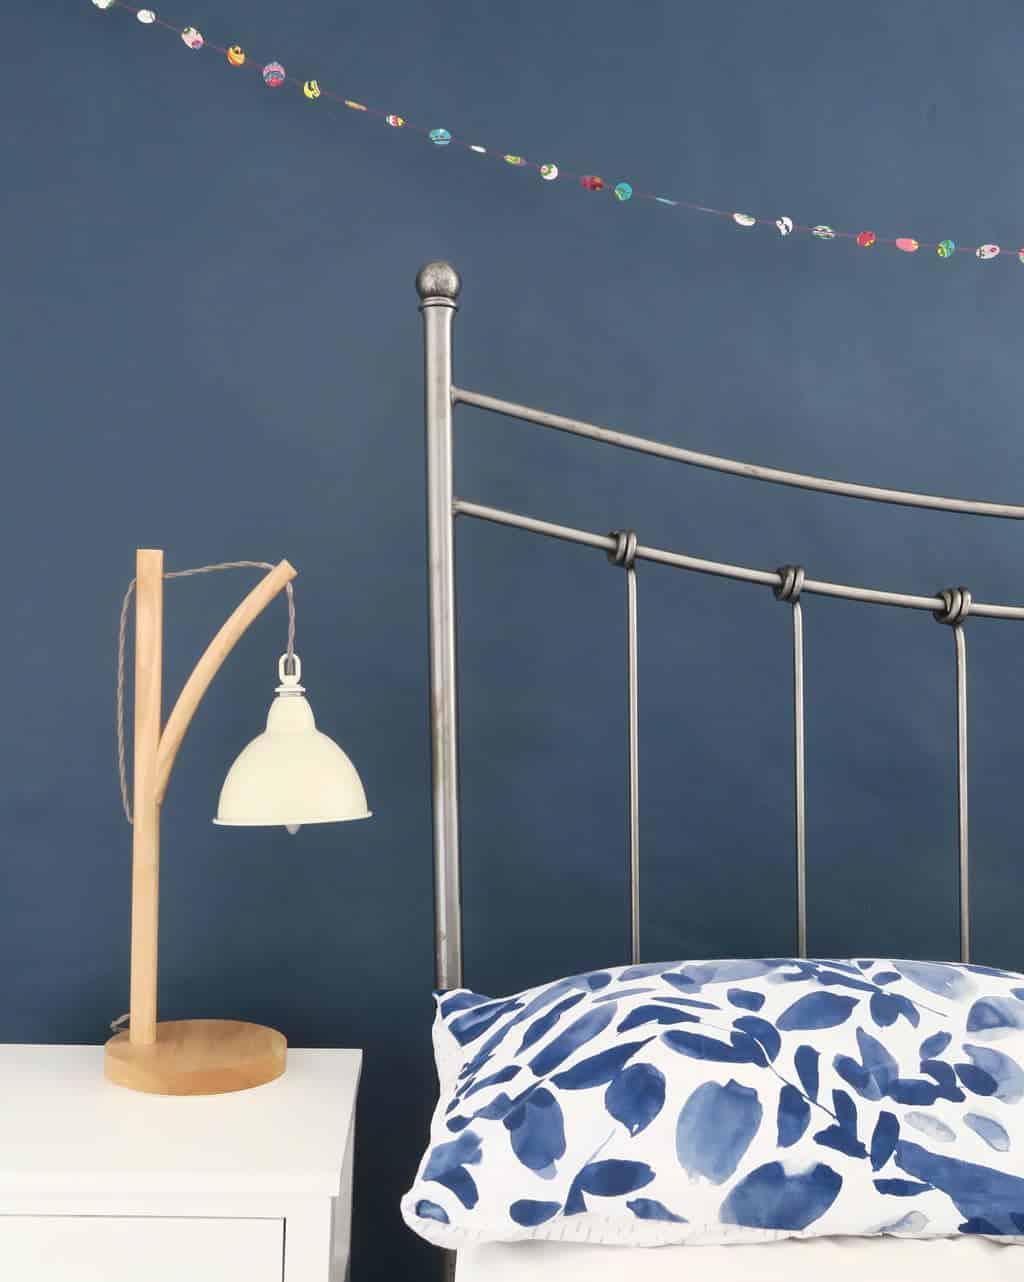 Deep navy blue walls in a bedroom — very restful.